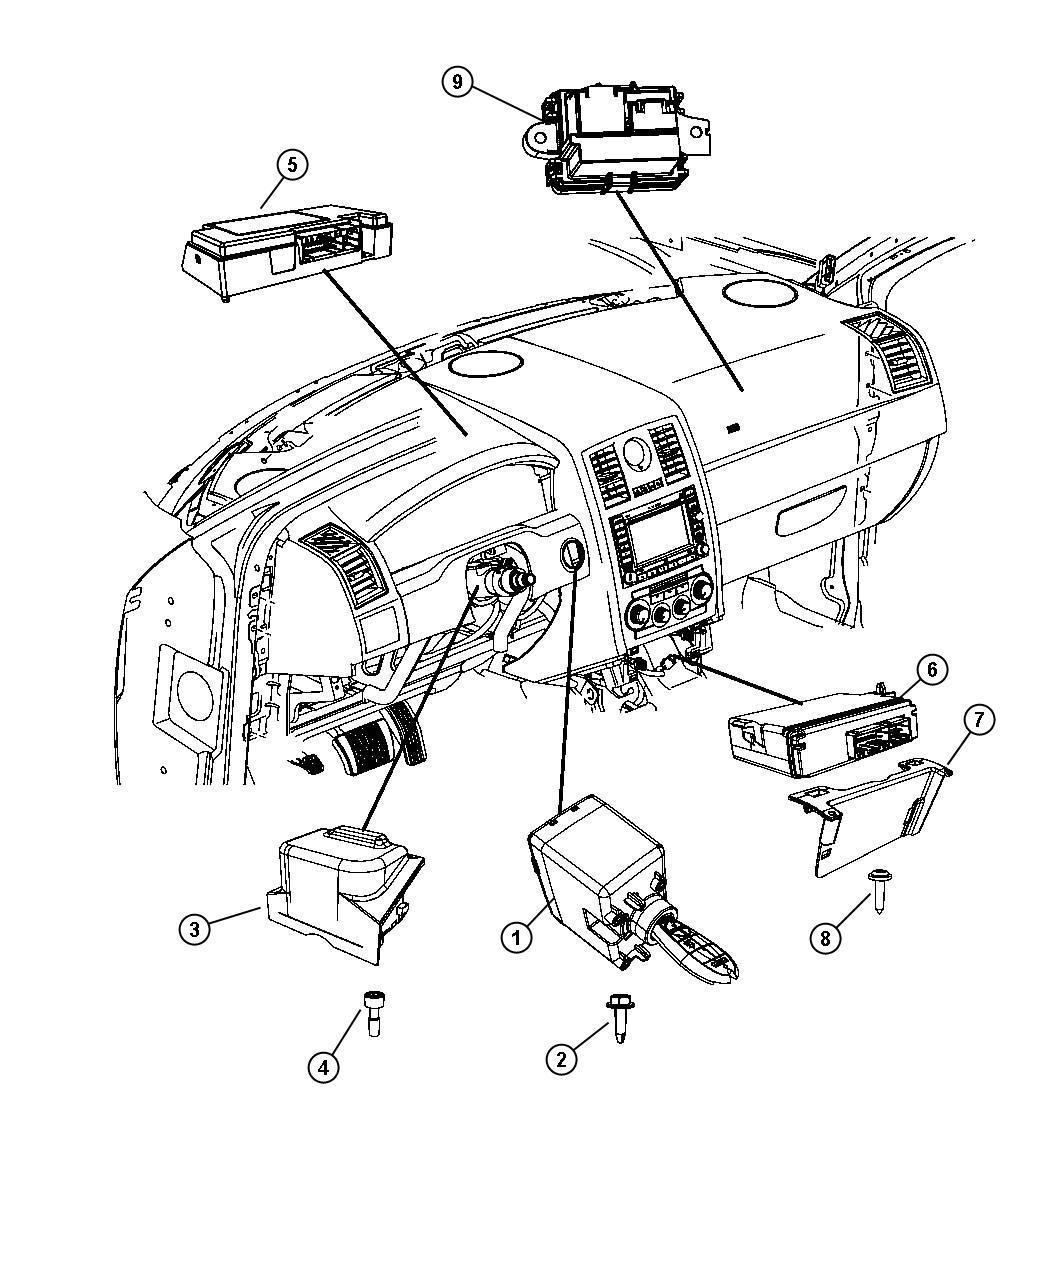 2008 Chrysler 300 Module. Steering control. [sau], [tilt